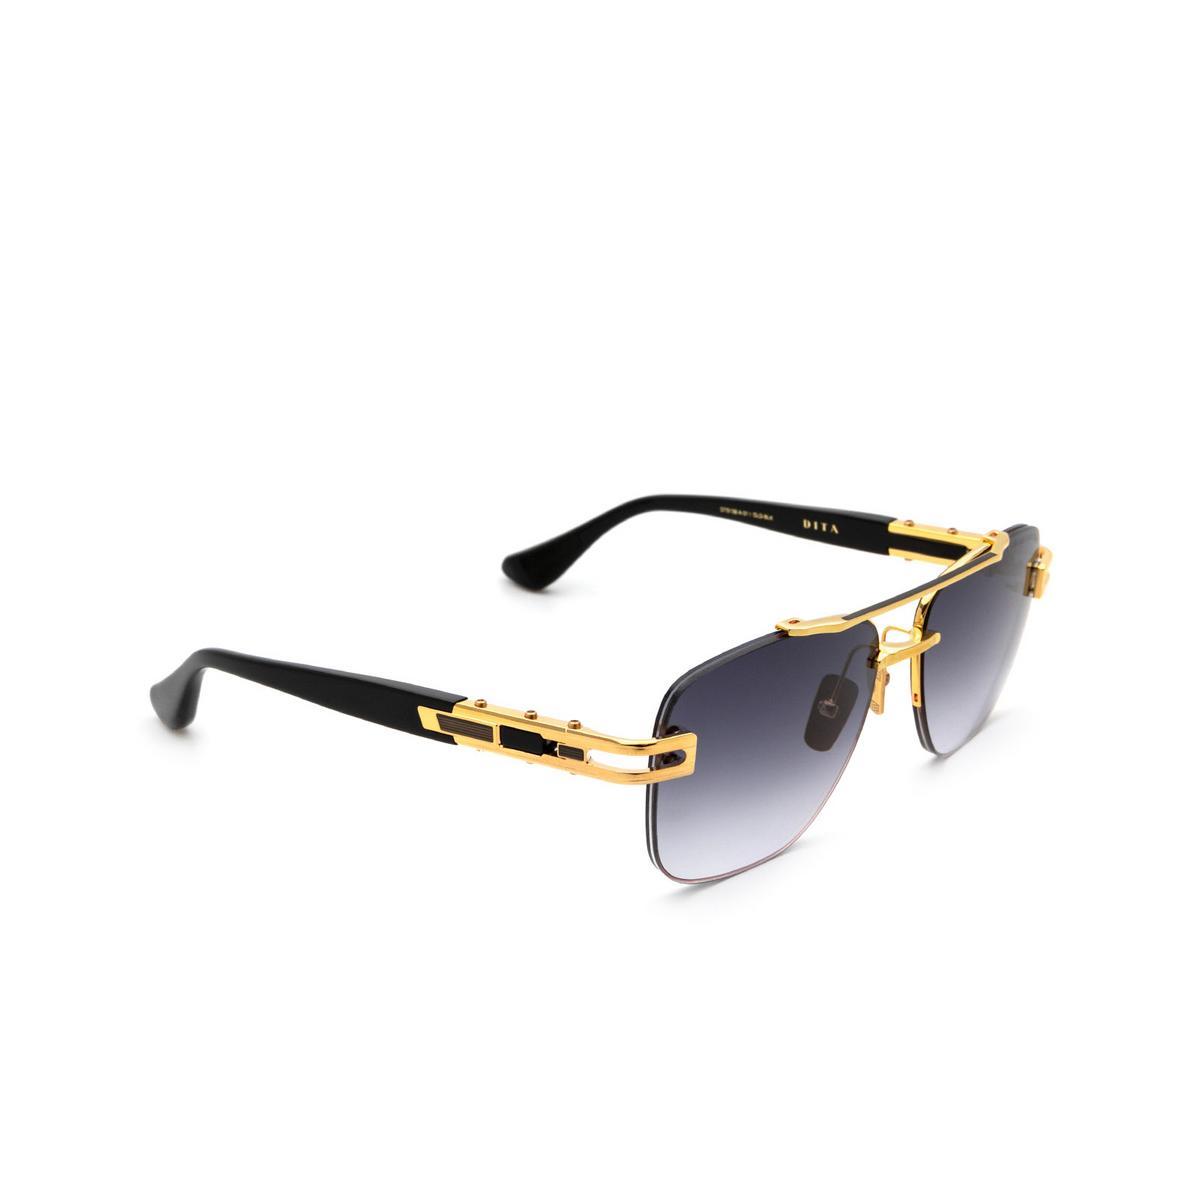 Dita® Aviator Sunglasses: Grand-evo One DTS138-A-01-Z color Gold Black Gld-blk.